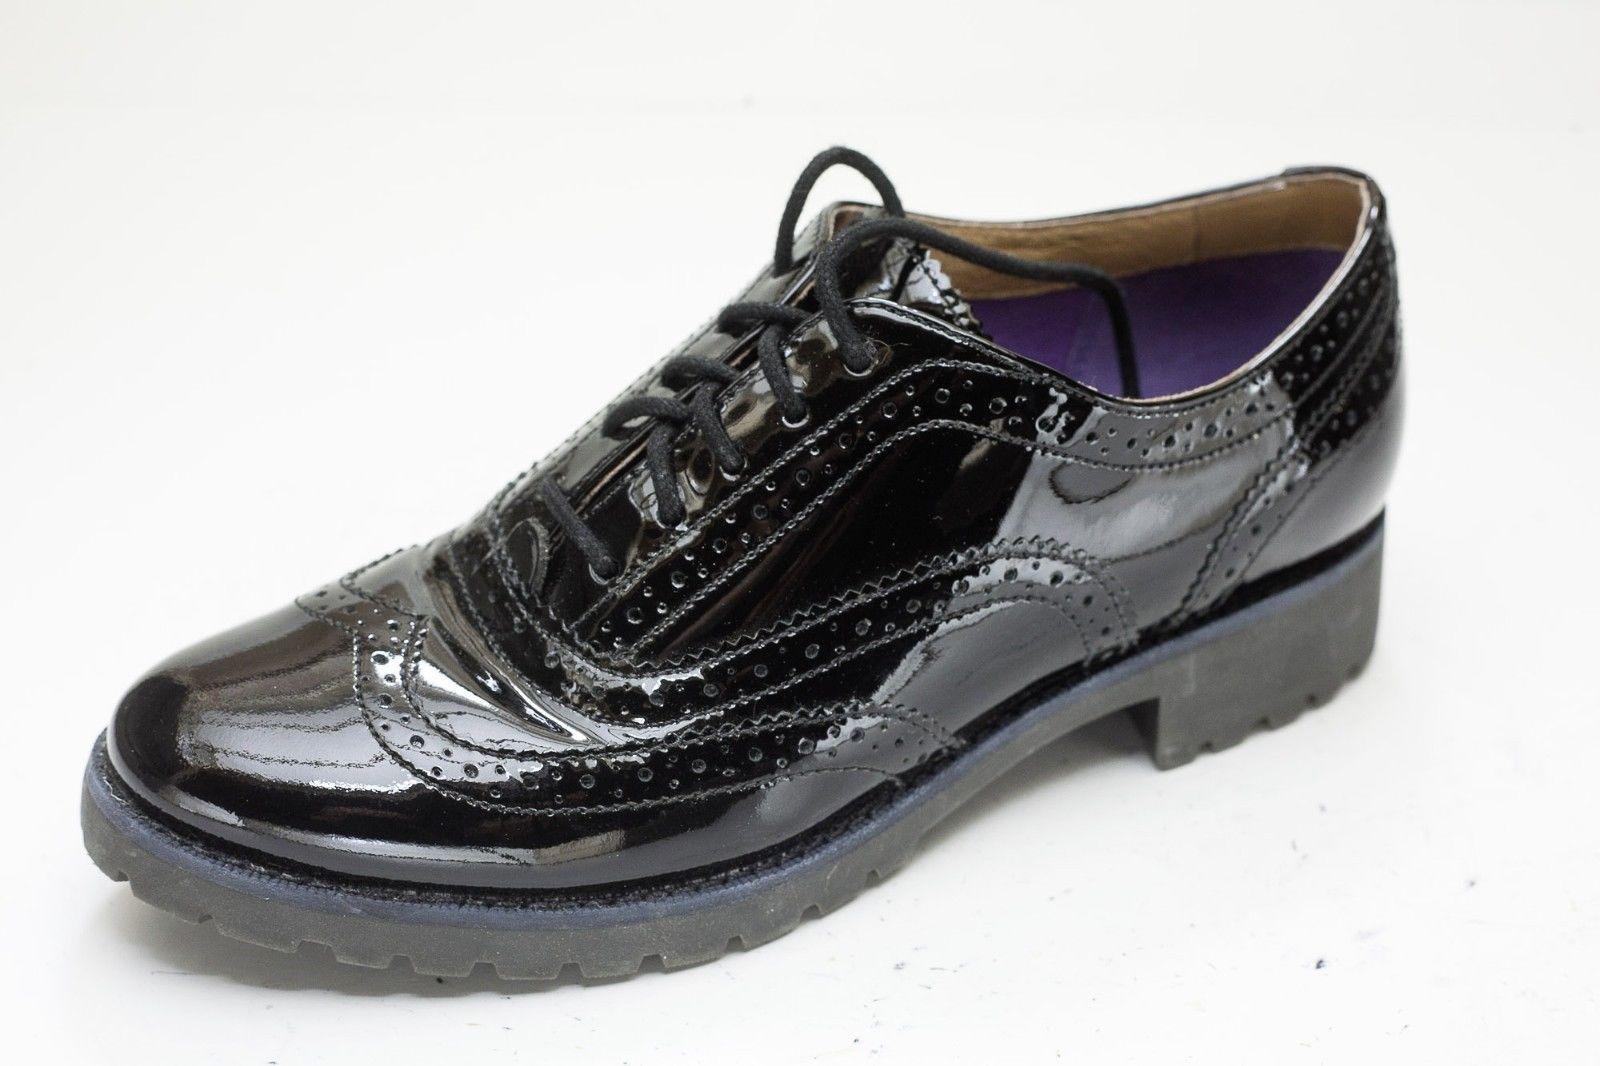 Sperry Top-Sider 6.5 Black Wingtip Brogue Oxford Shoe Women's